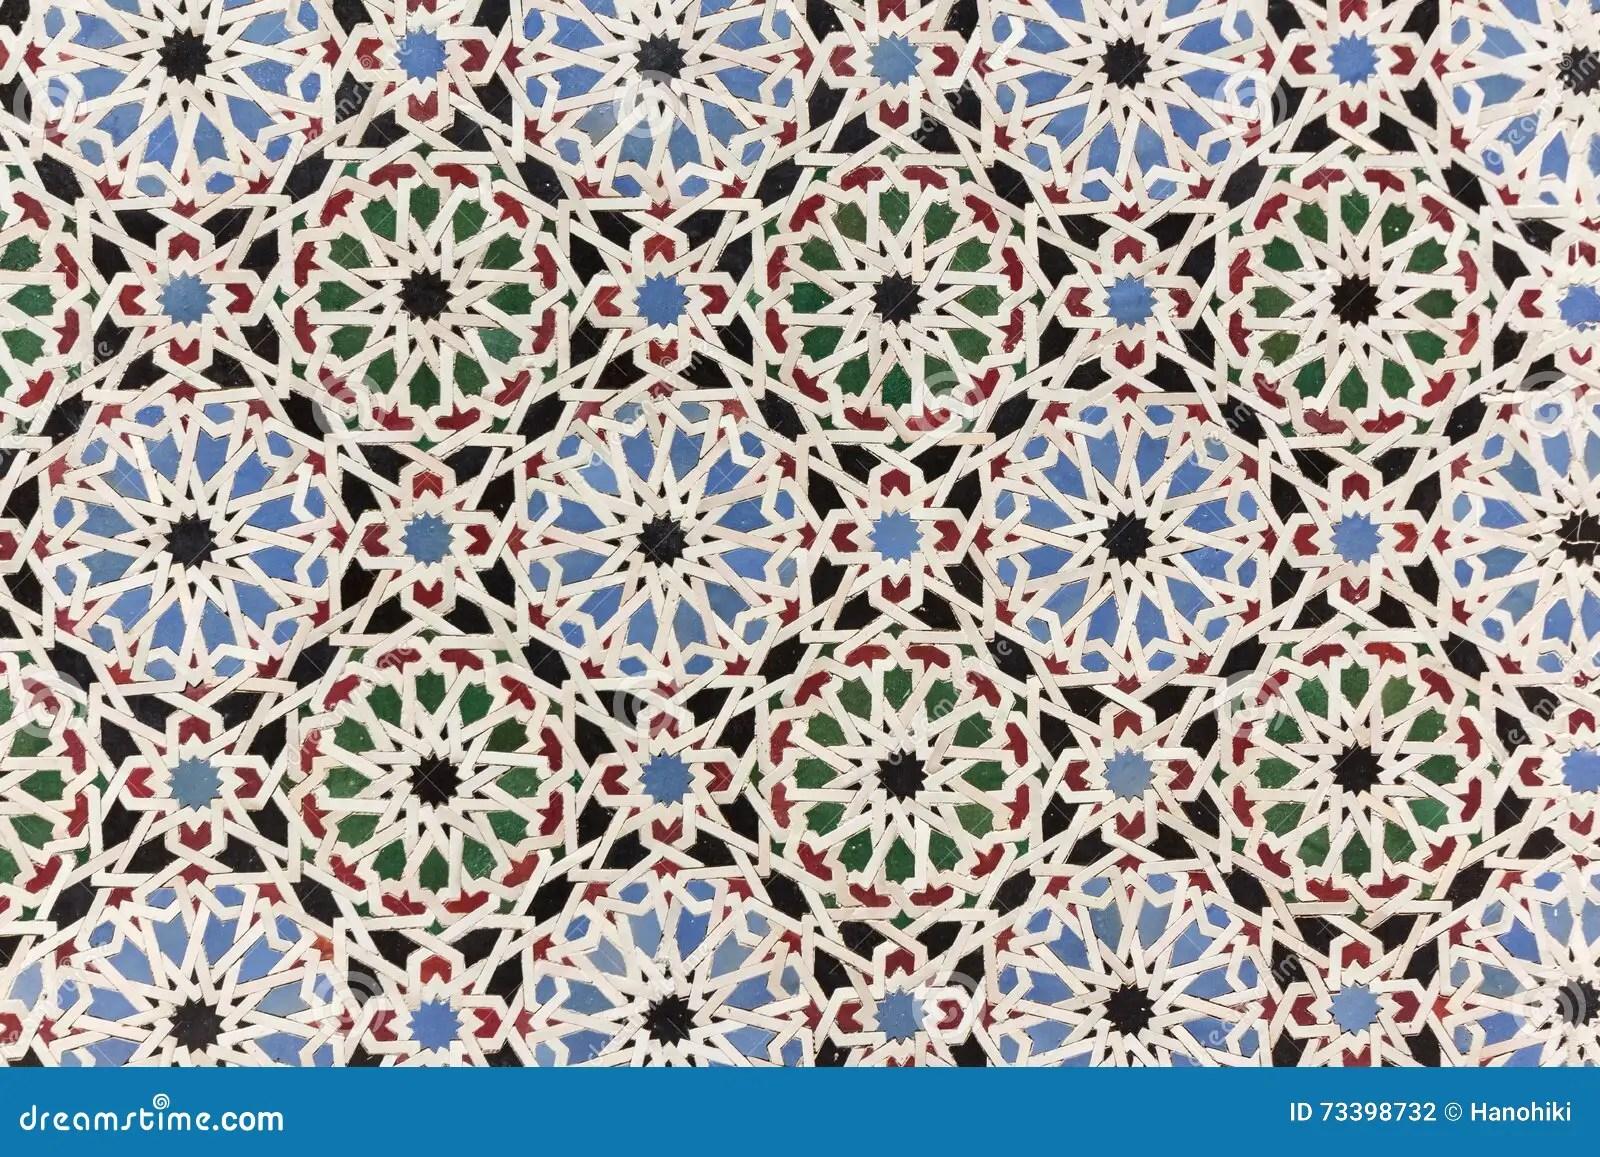 Oriental Mosaic Decoration  Morocco Wall Tiles Stock